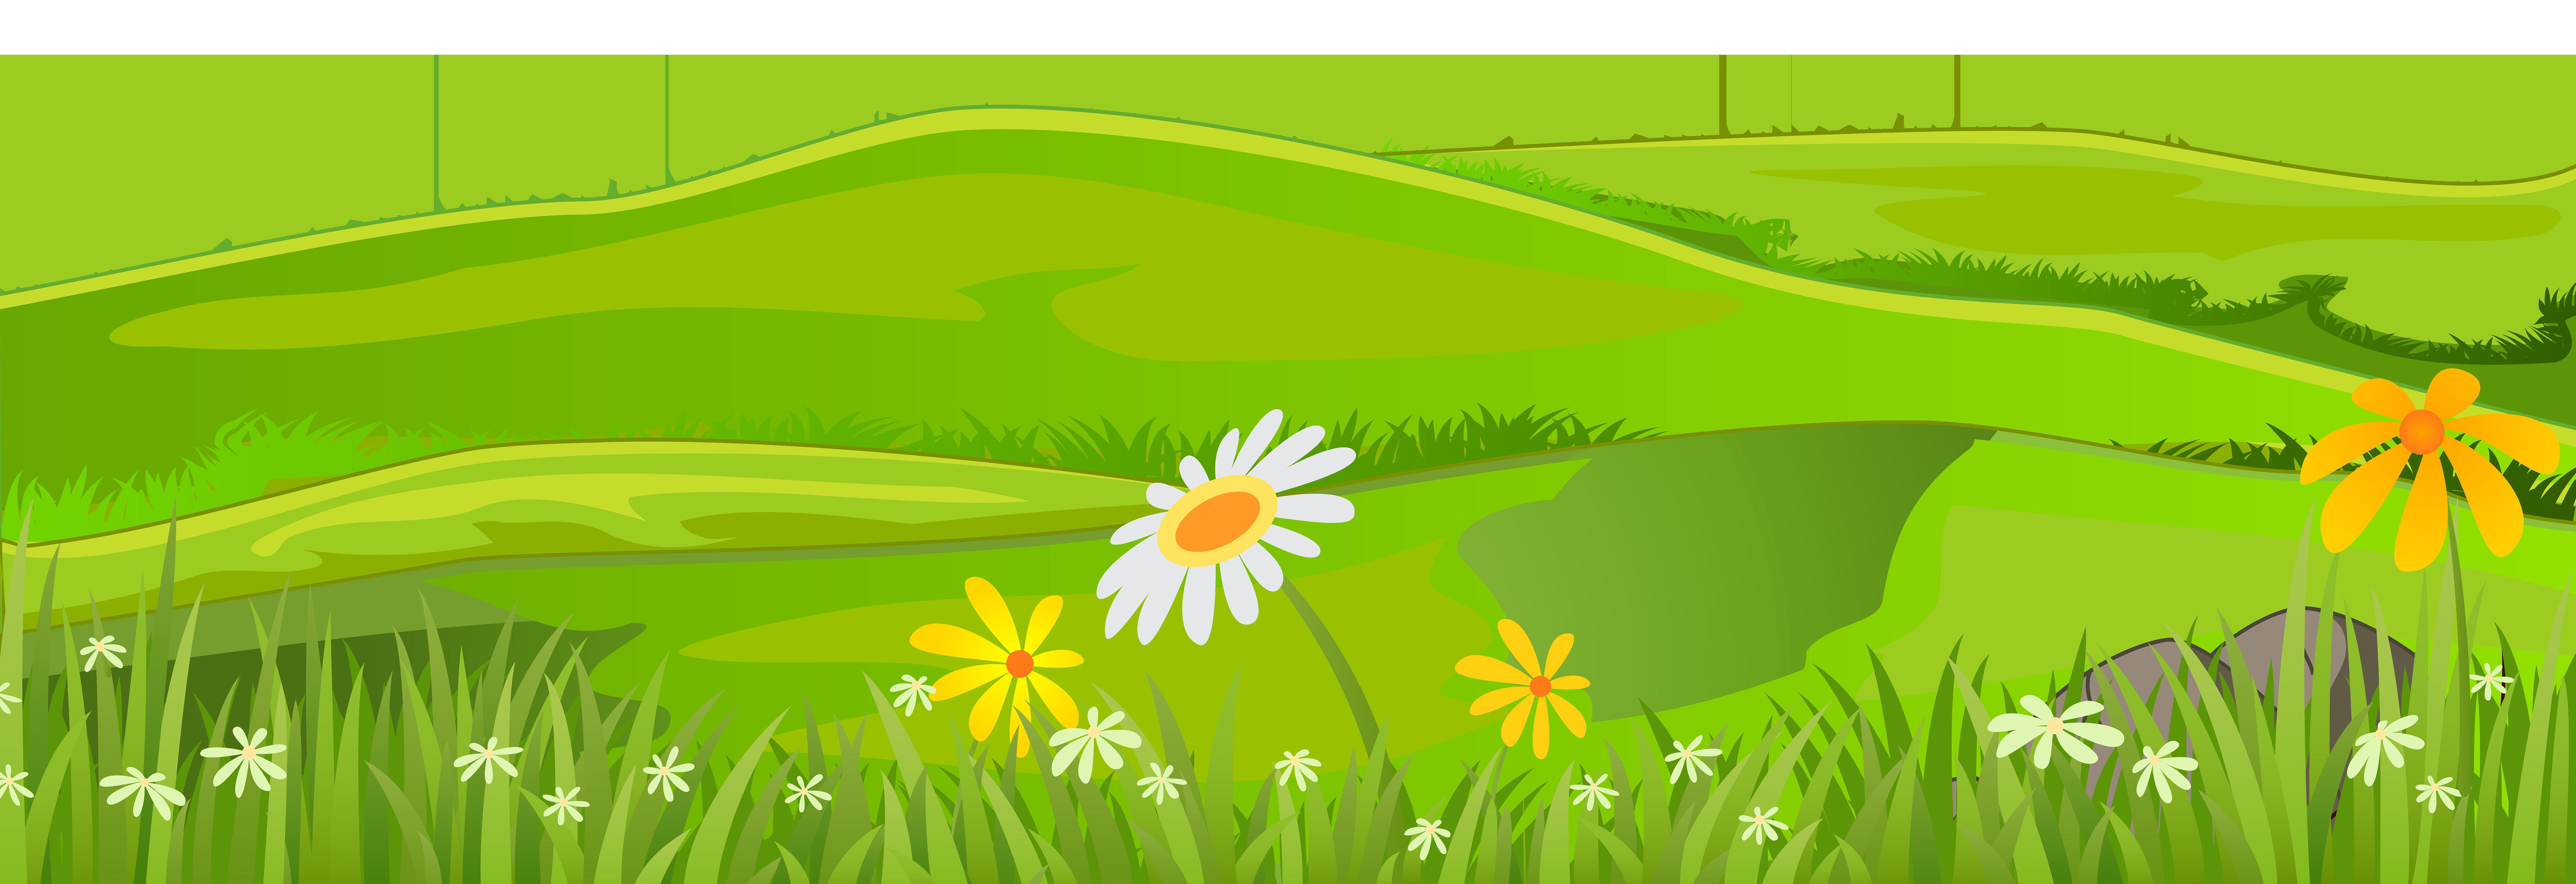 Grass sun clipart transparent stock Grass Cover PNG Clip Art Image | Gallery Yopriceville - High ... transparent stock